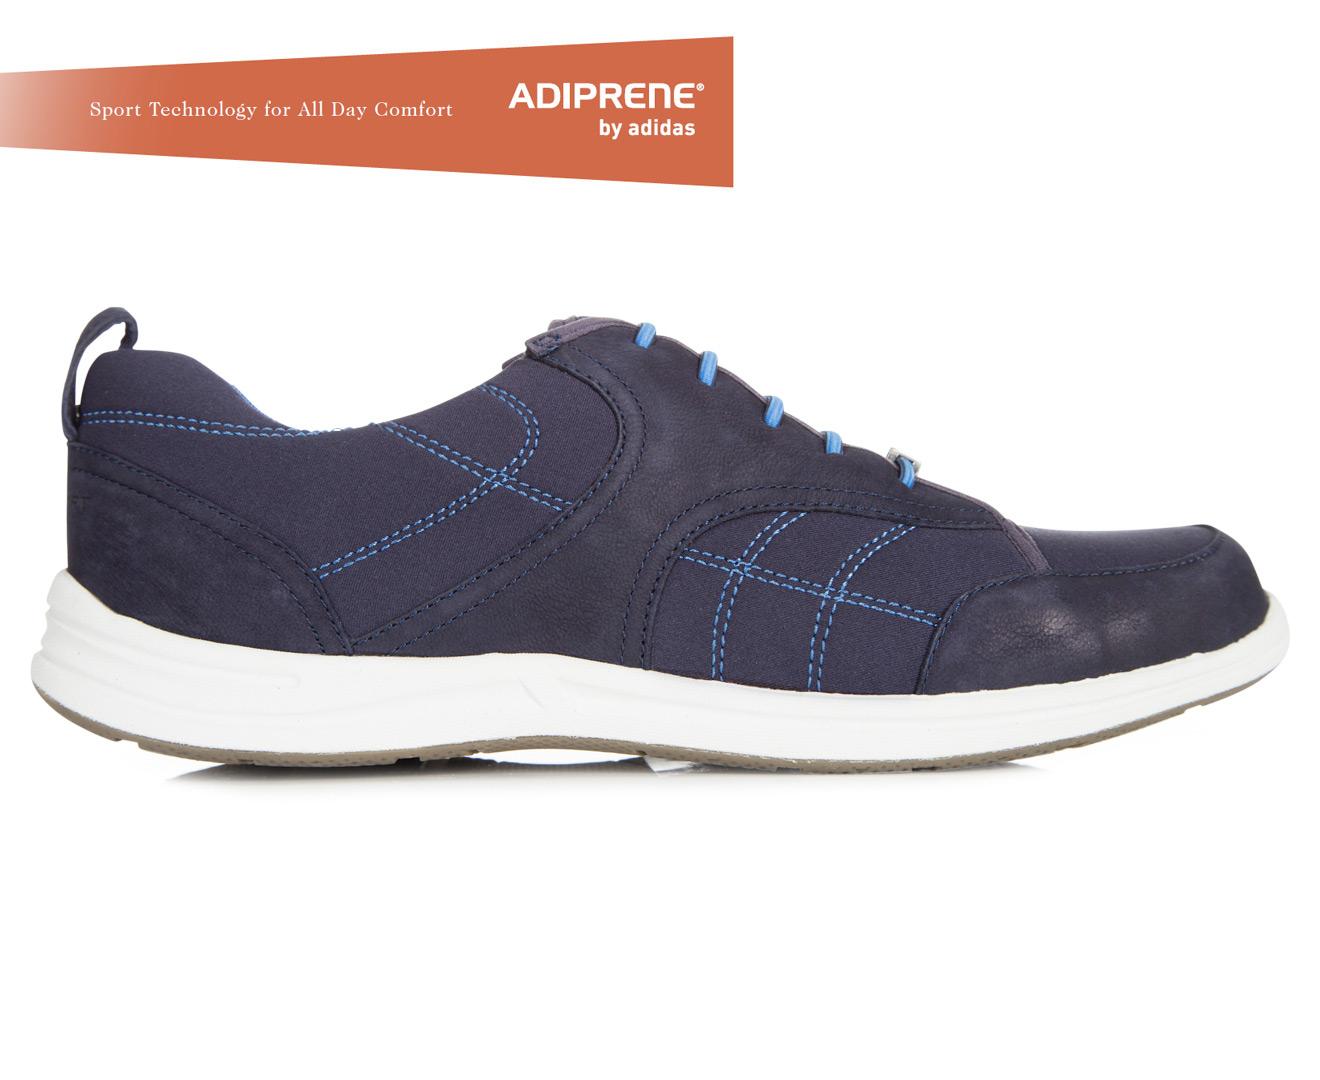 cc0e658a7cf04e rockport adiprene by adidas sport technology